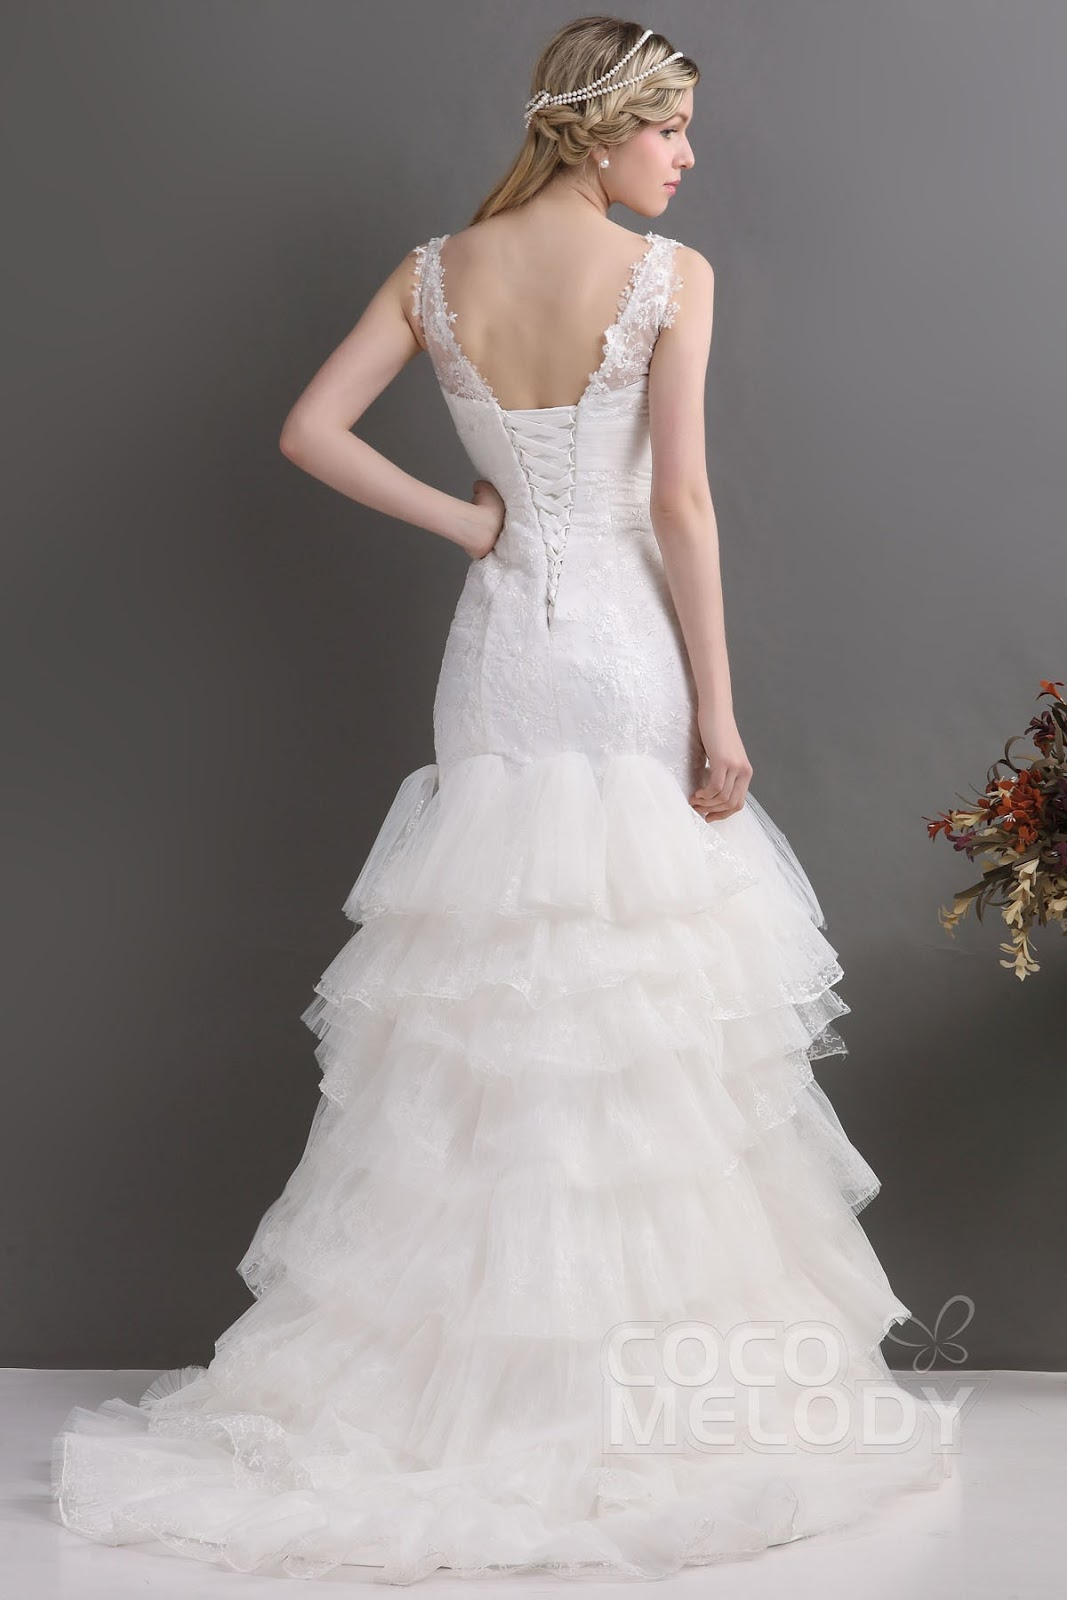 cdac77716f5 princess flower girl dresses  How to pick wedding dresses for anyone ...